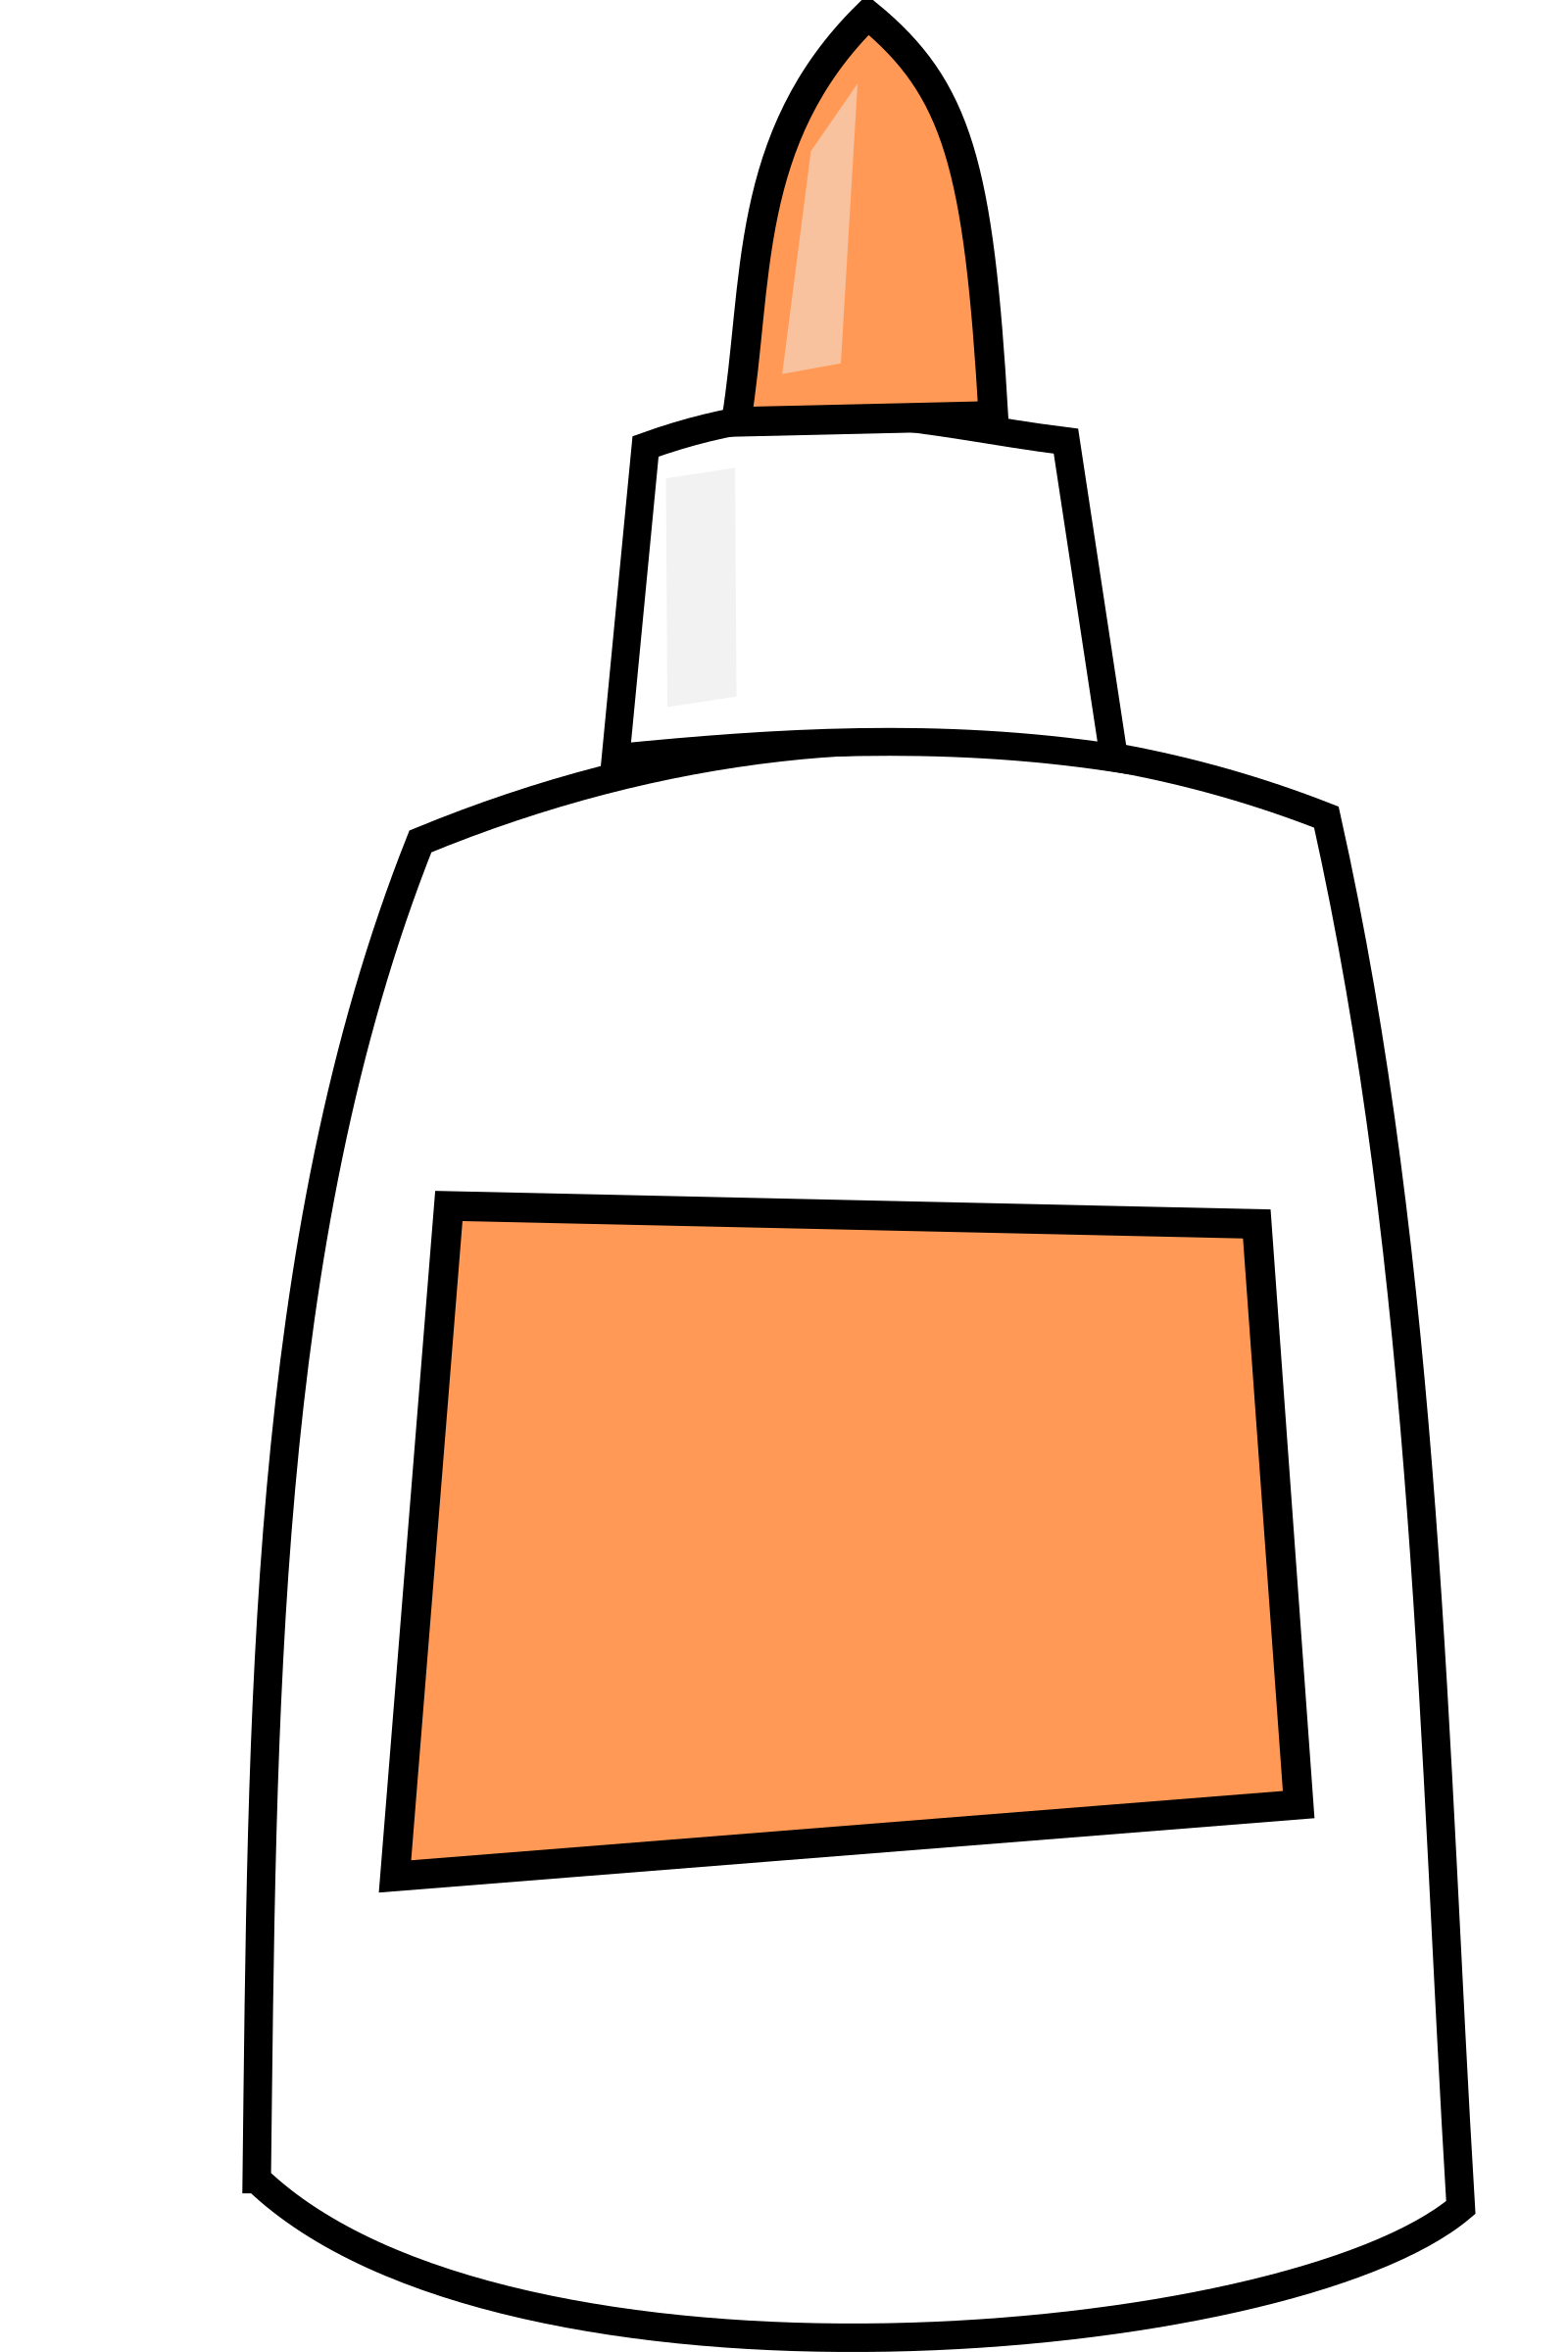 Glue Bottle Clipart Group (+), HD Clipart.